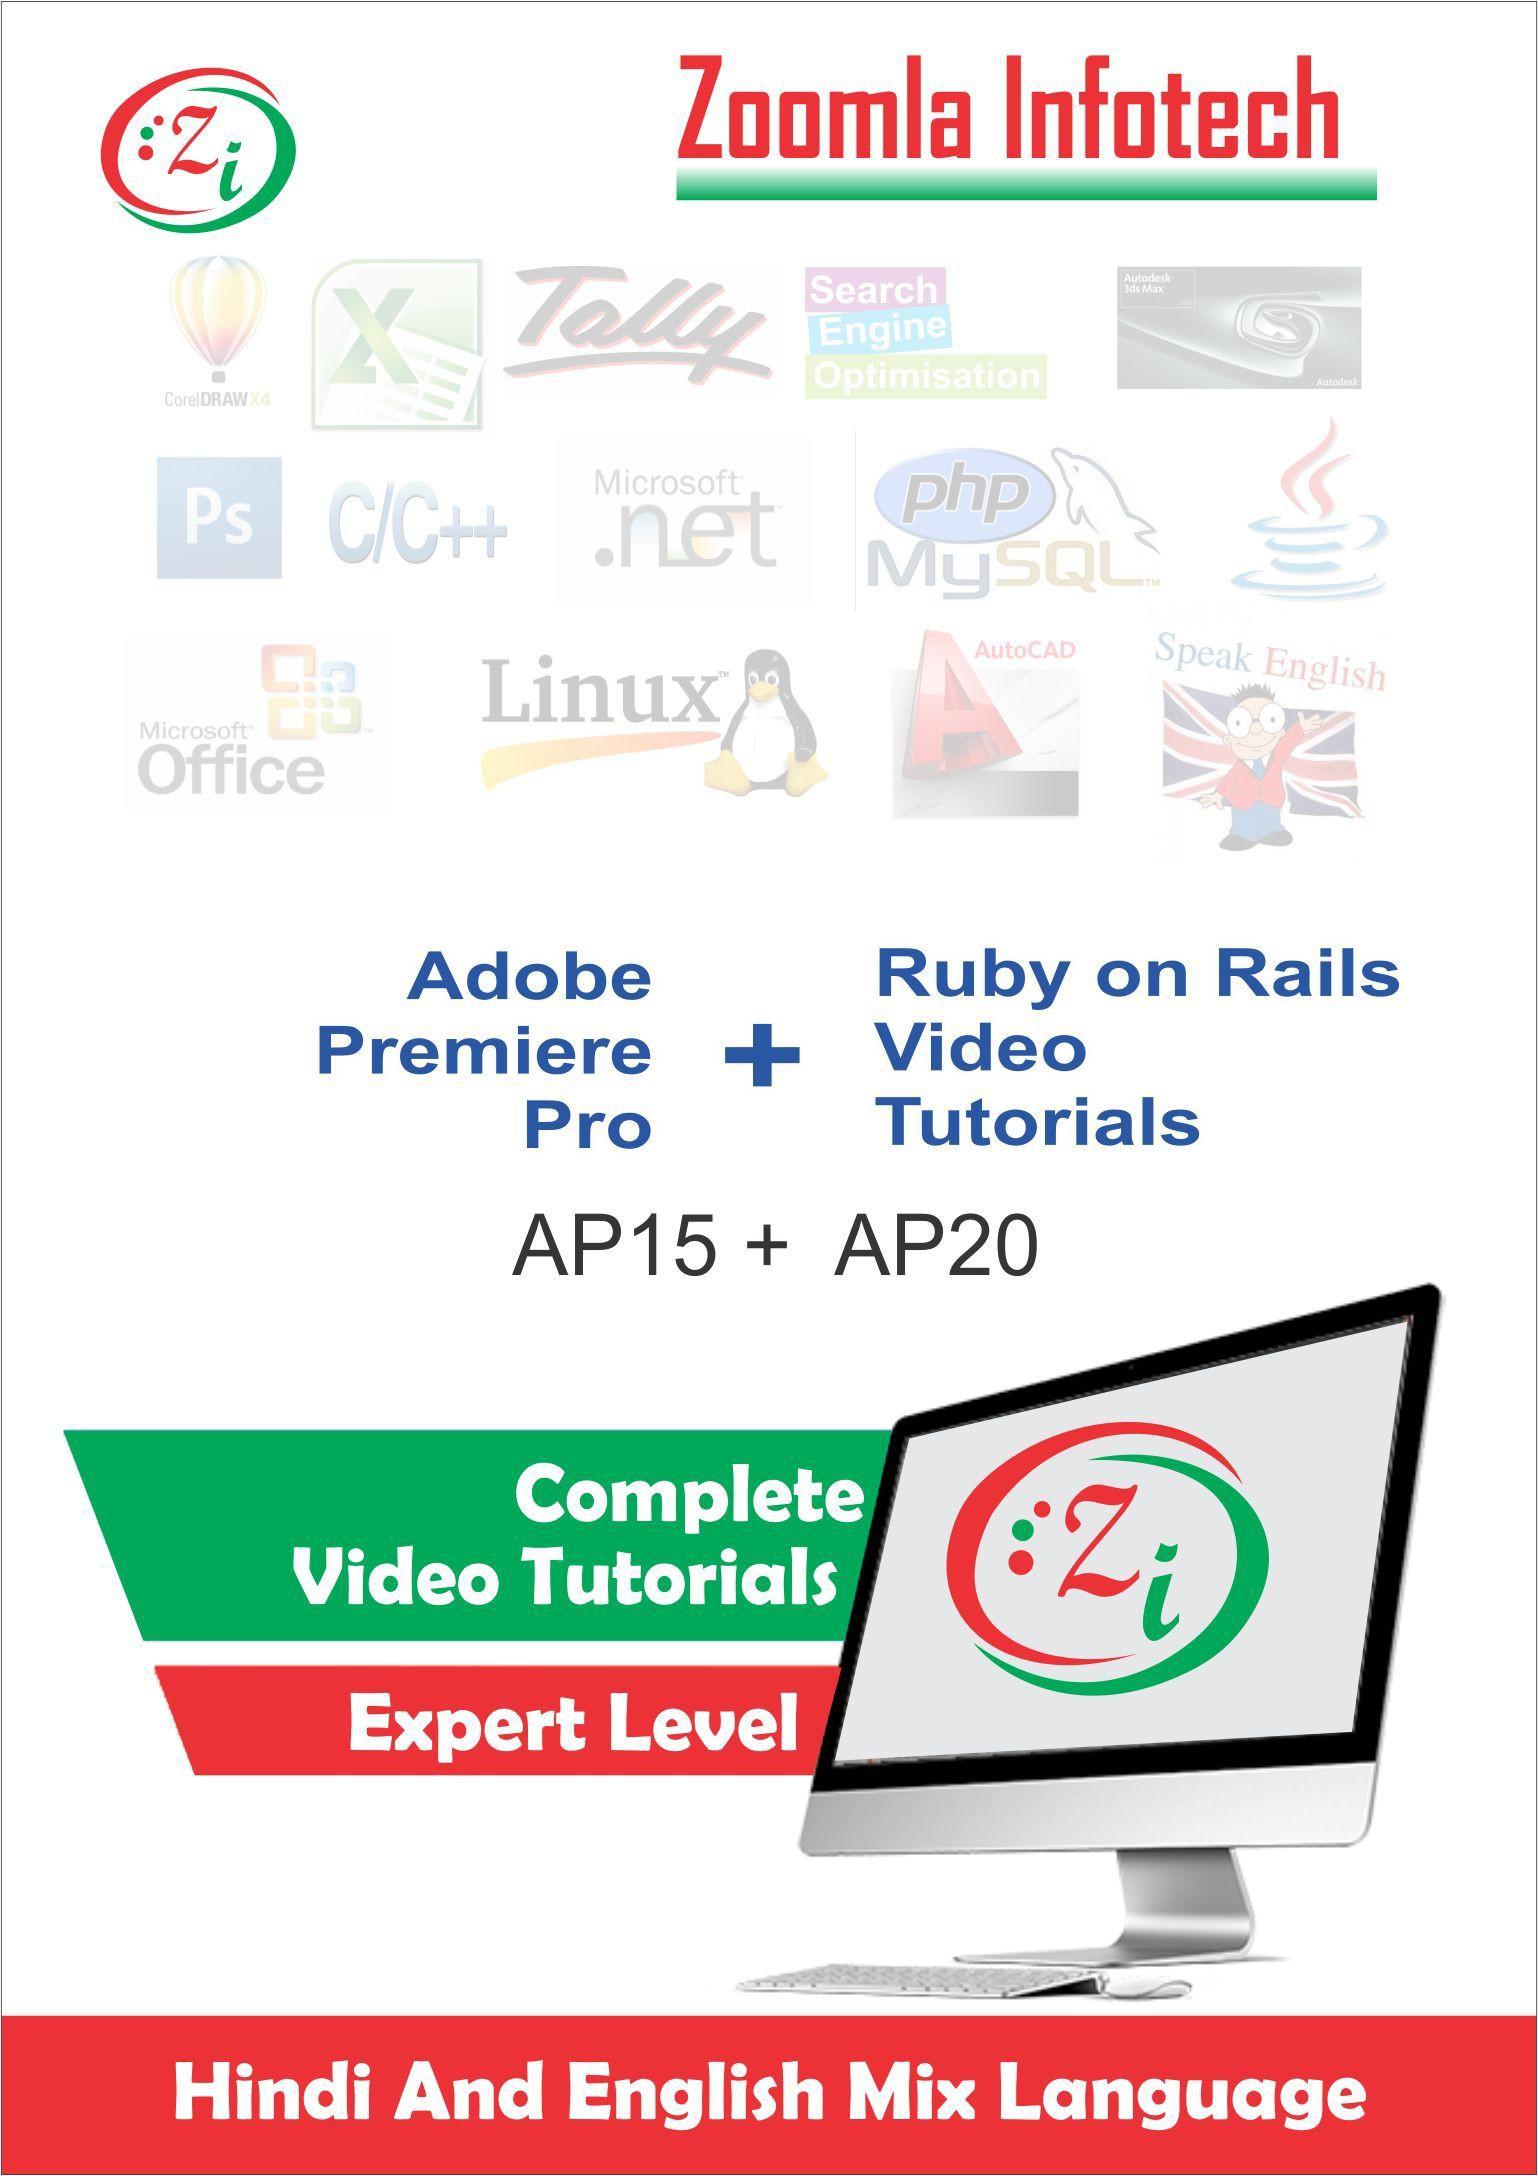 Complete java video tutorials courses torrent dragon torrents biz complete java video tutorials courses torrent dragon torrents biz baditri Image collections